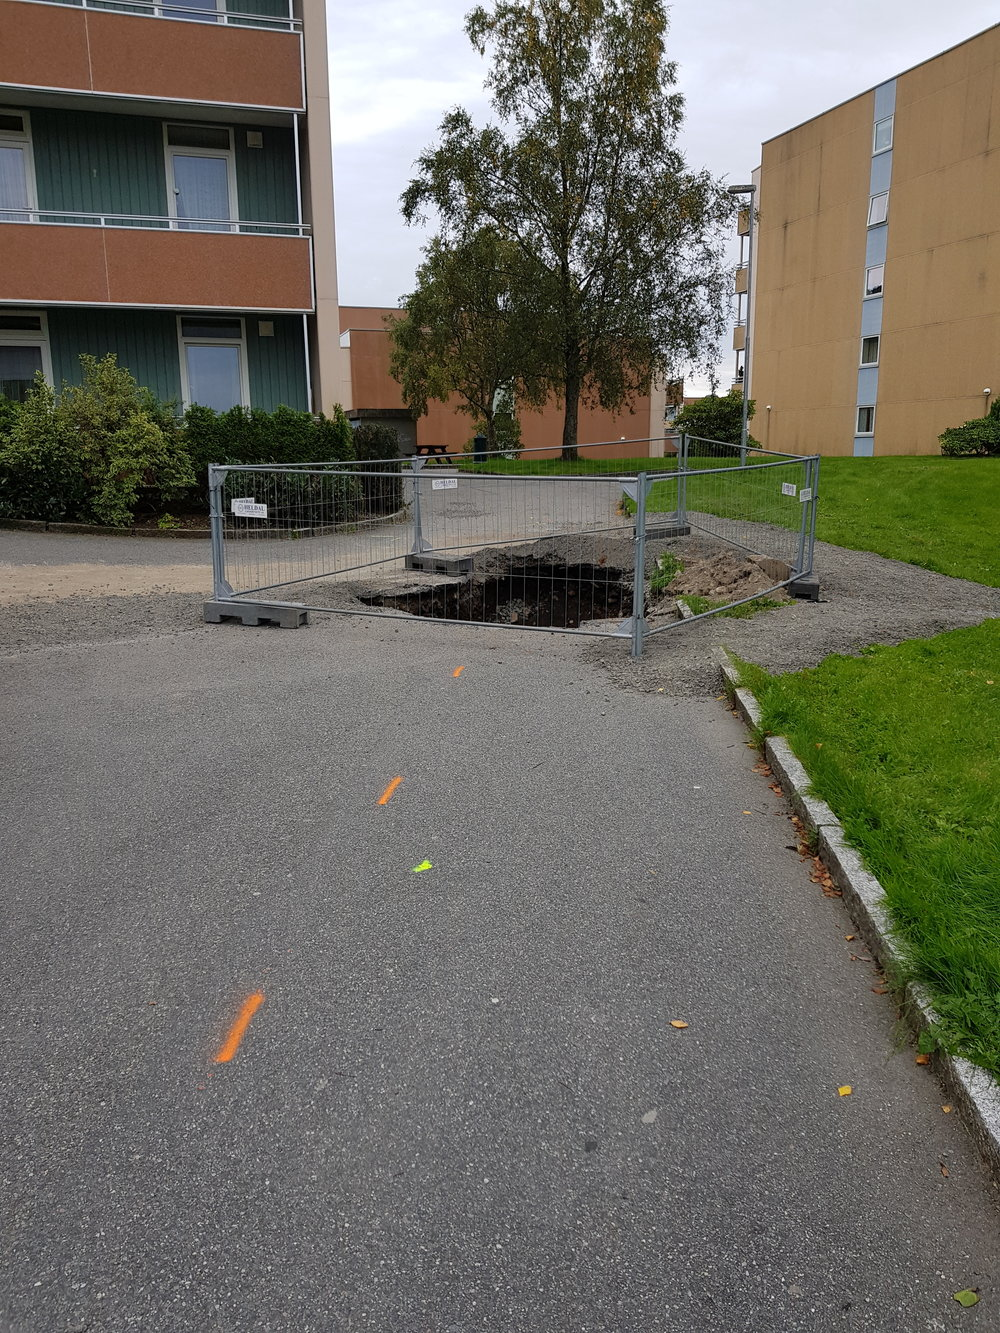 Aha! A hole!